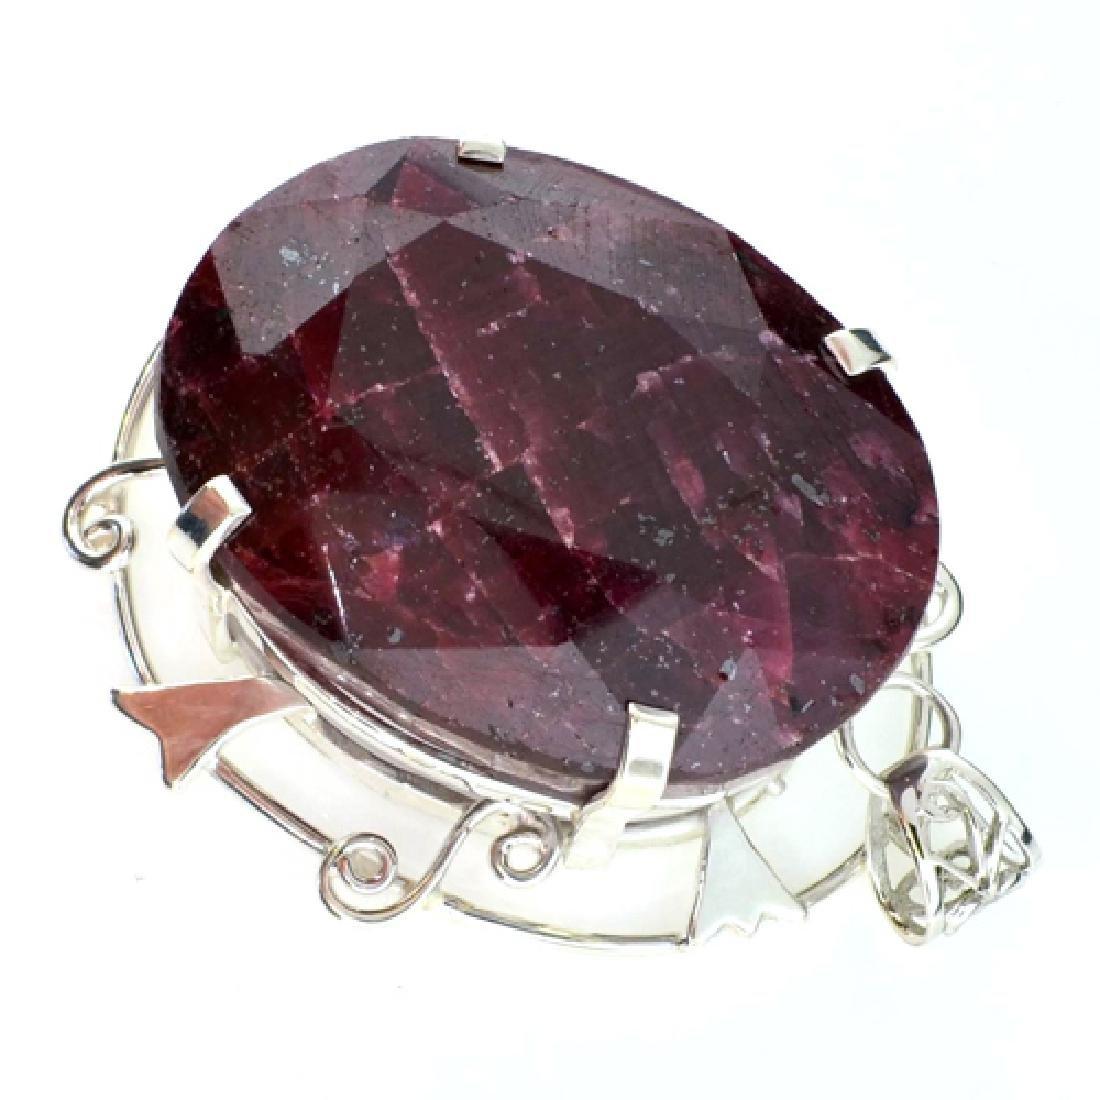 APP: 17.1k Fine Jewelry Designer Sebastian 401.42CT